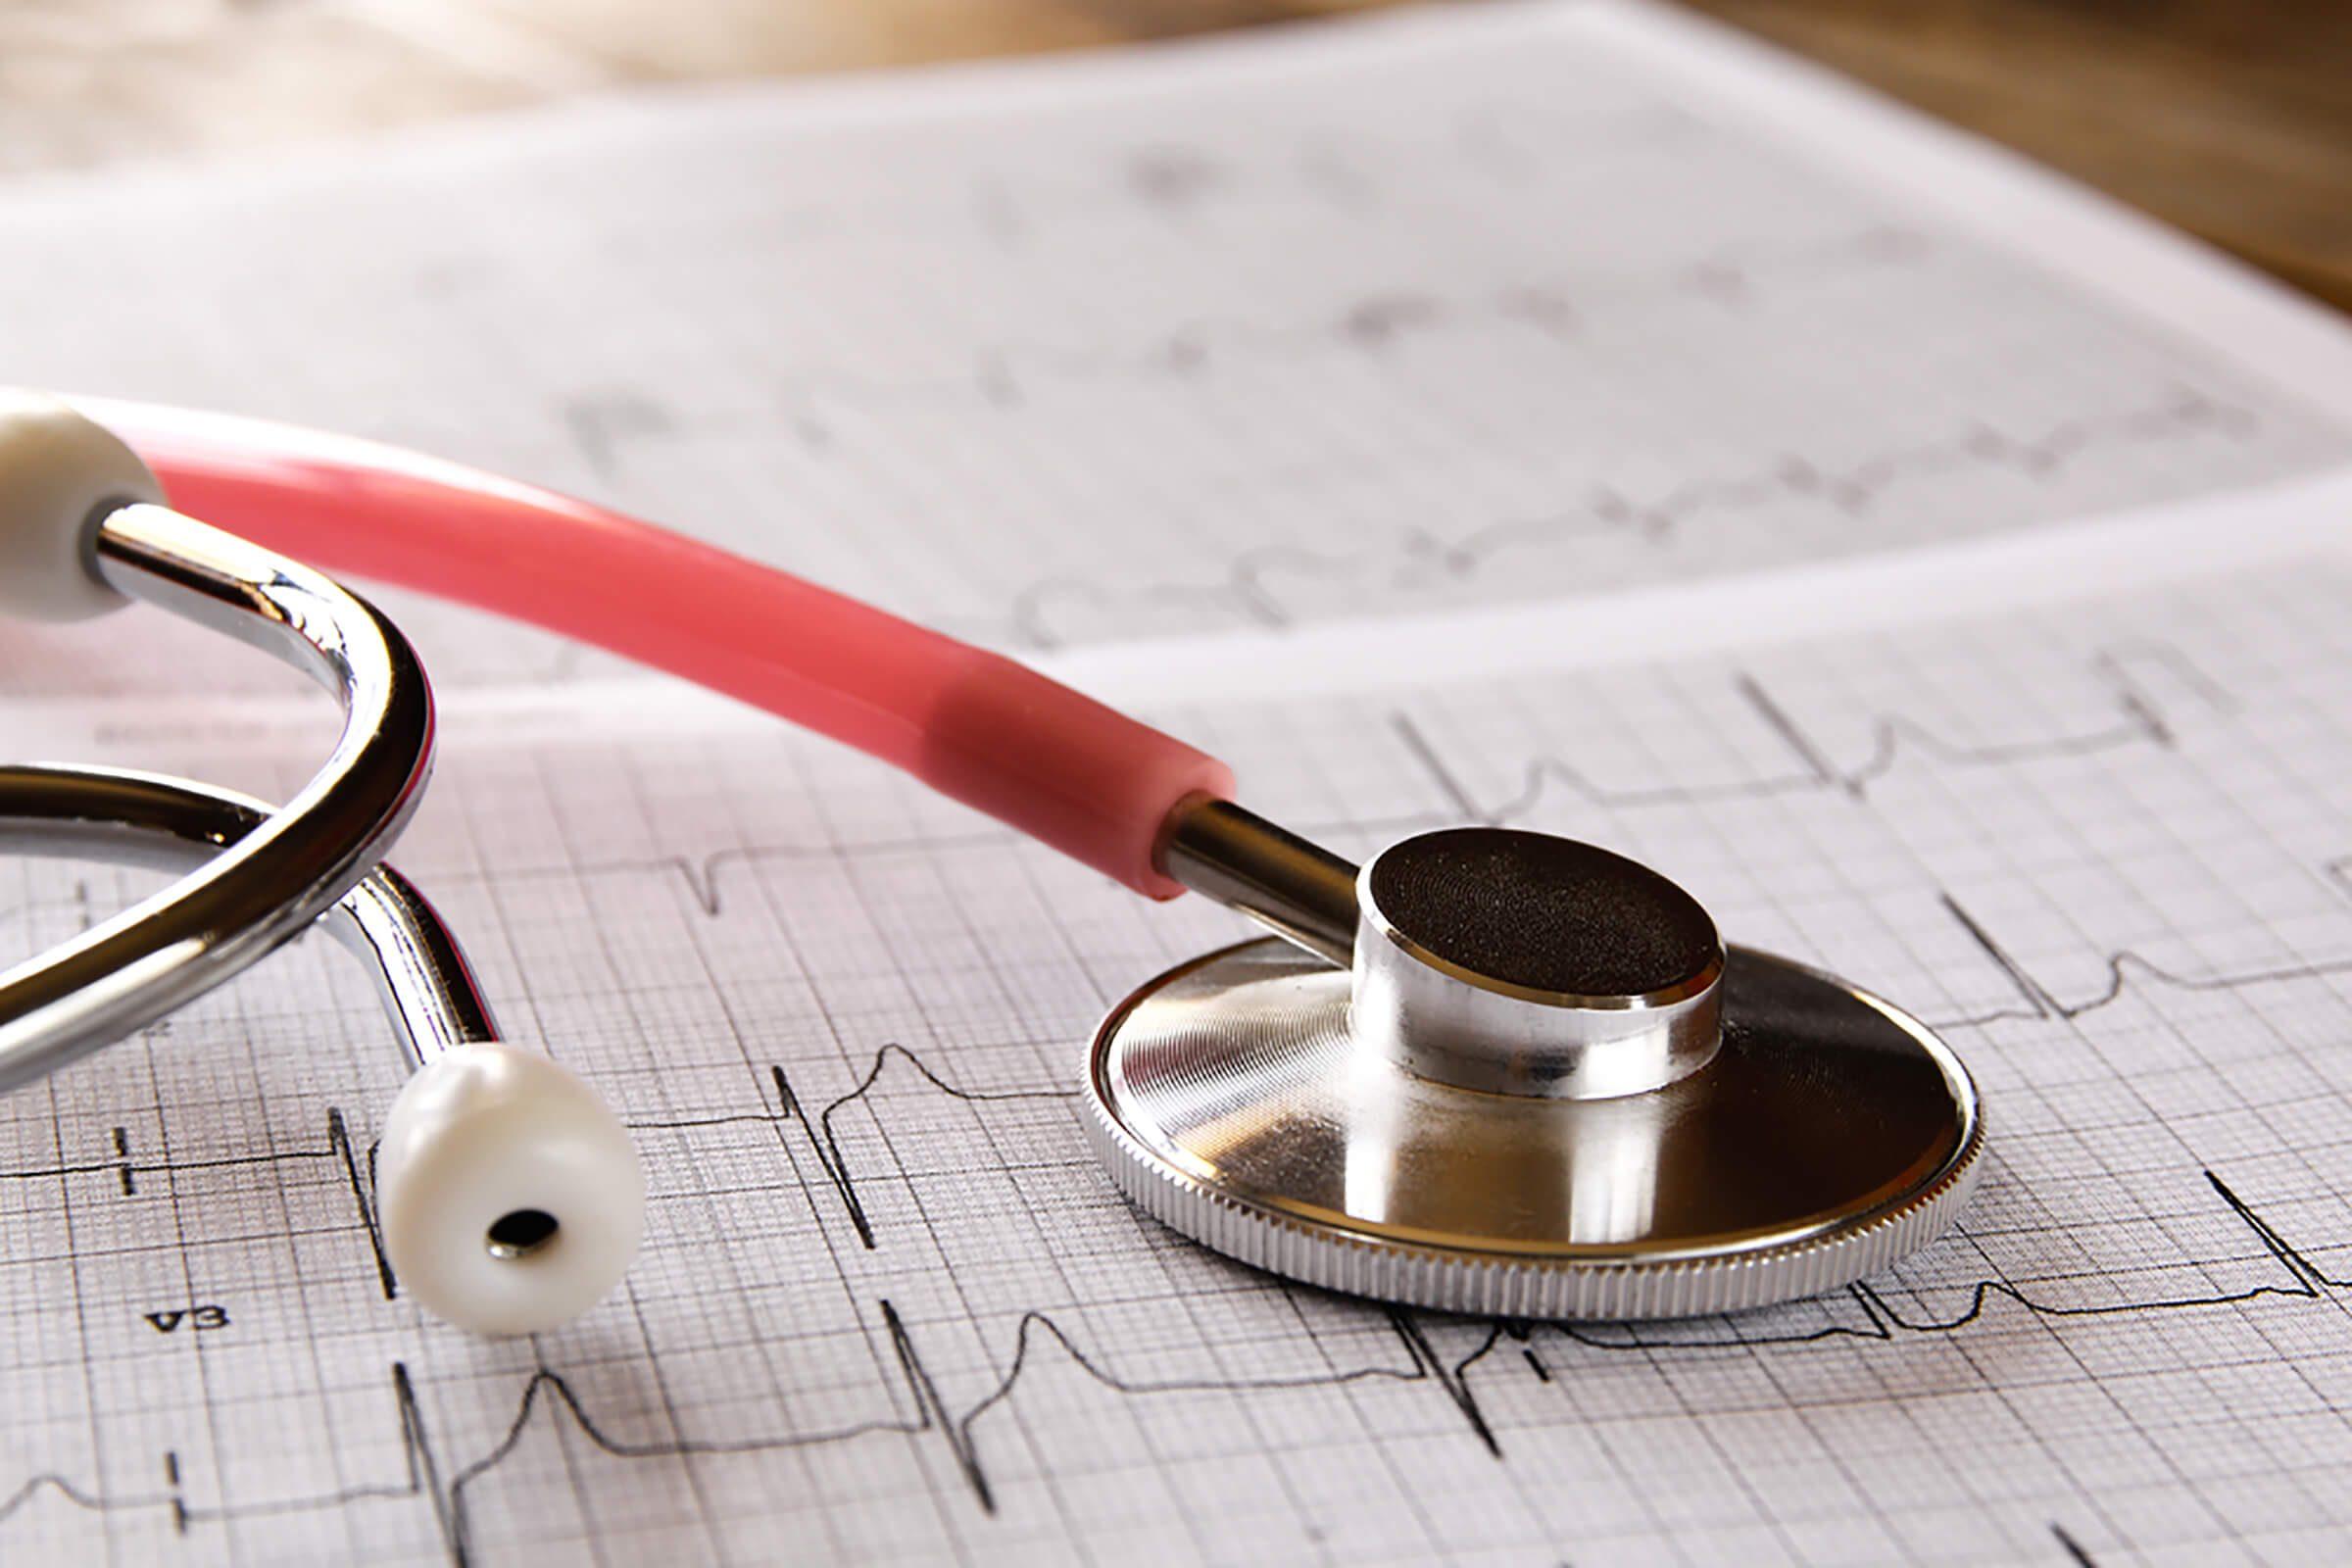 type 2 diabetes complications | Stethoscope on ekg printout